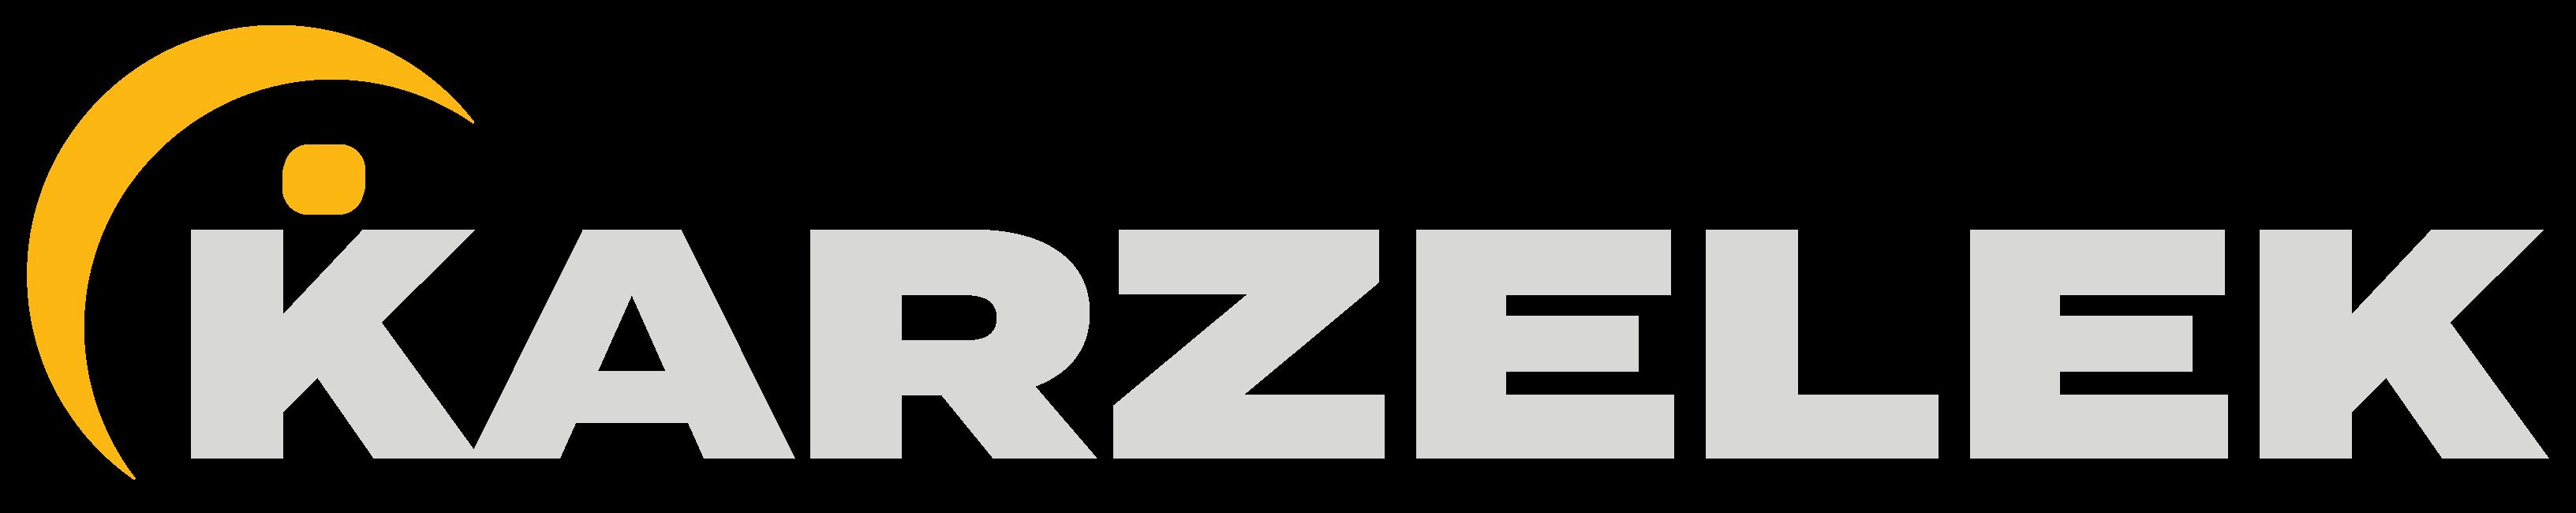 Karzelek